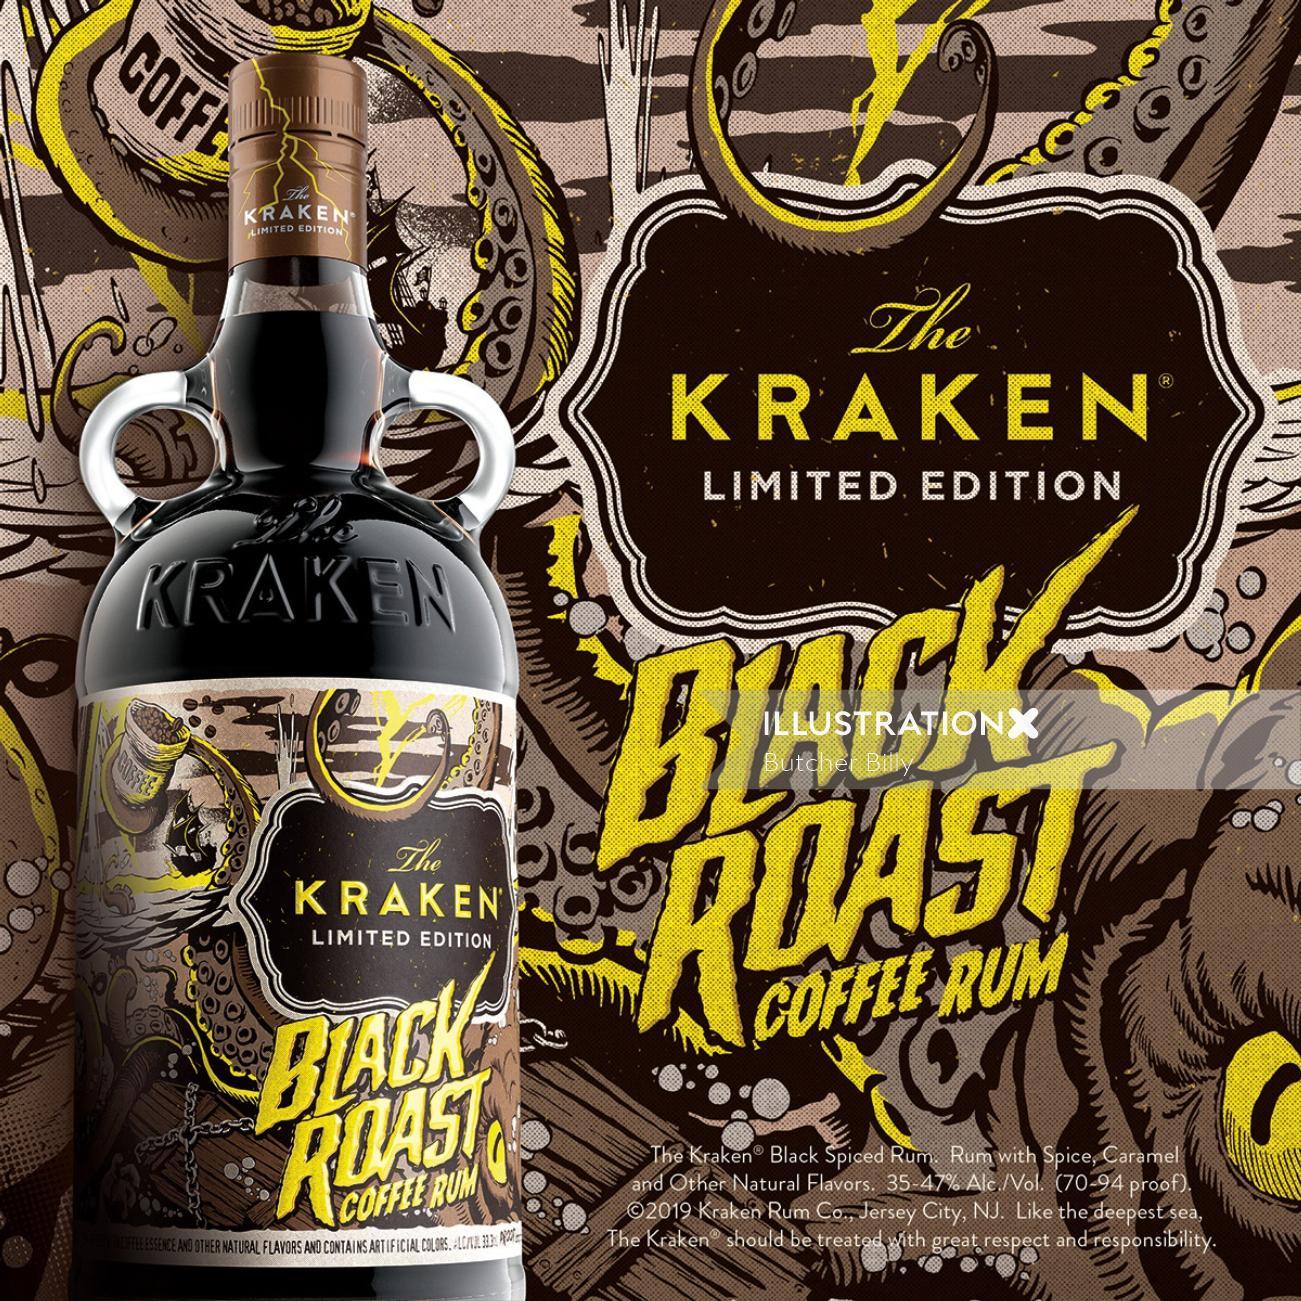 Black roast coffee run lettering